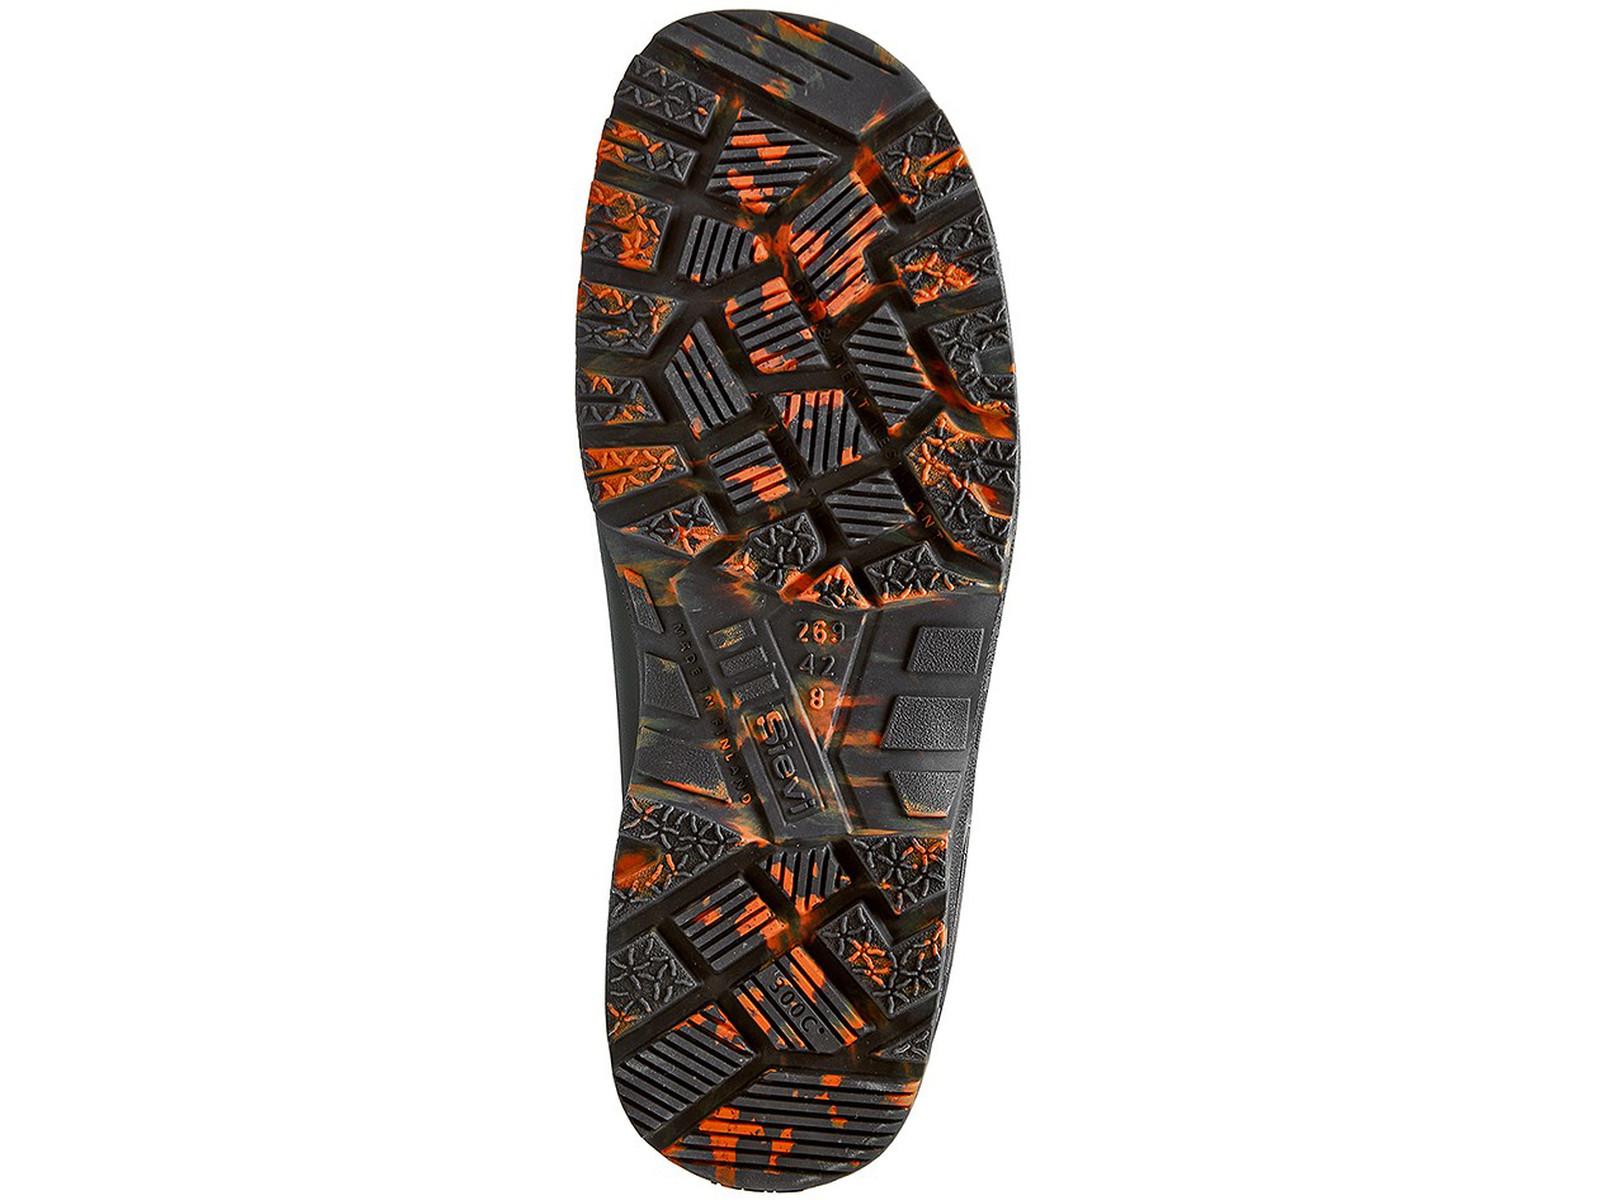 b548aec6 Safety Shoes - AL Hit 9 XL+ S3HRO » Sievin Jalkine Oy